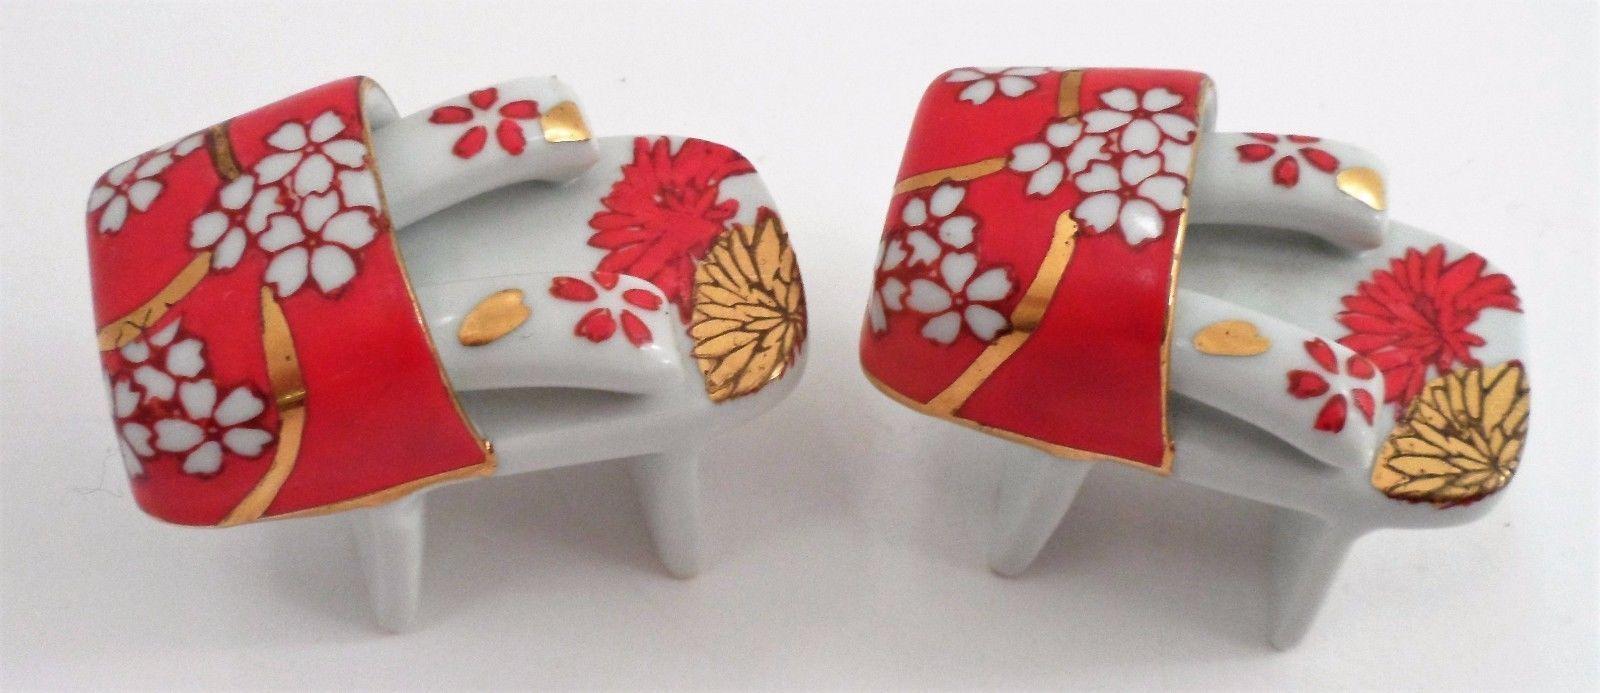 Red Gold Chrysanthemum Geisha Tall Shoes Sandals Porcelain Salt Pepper Shakers